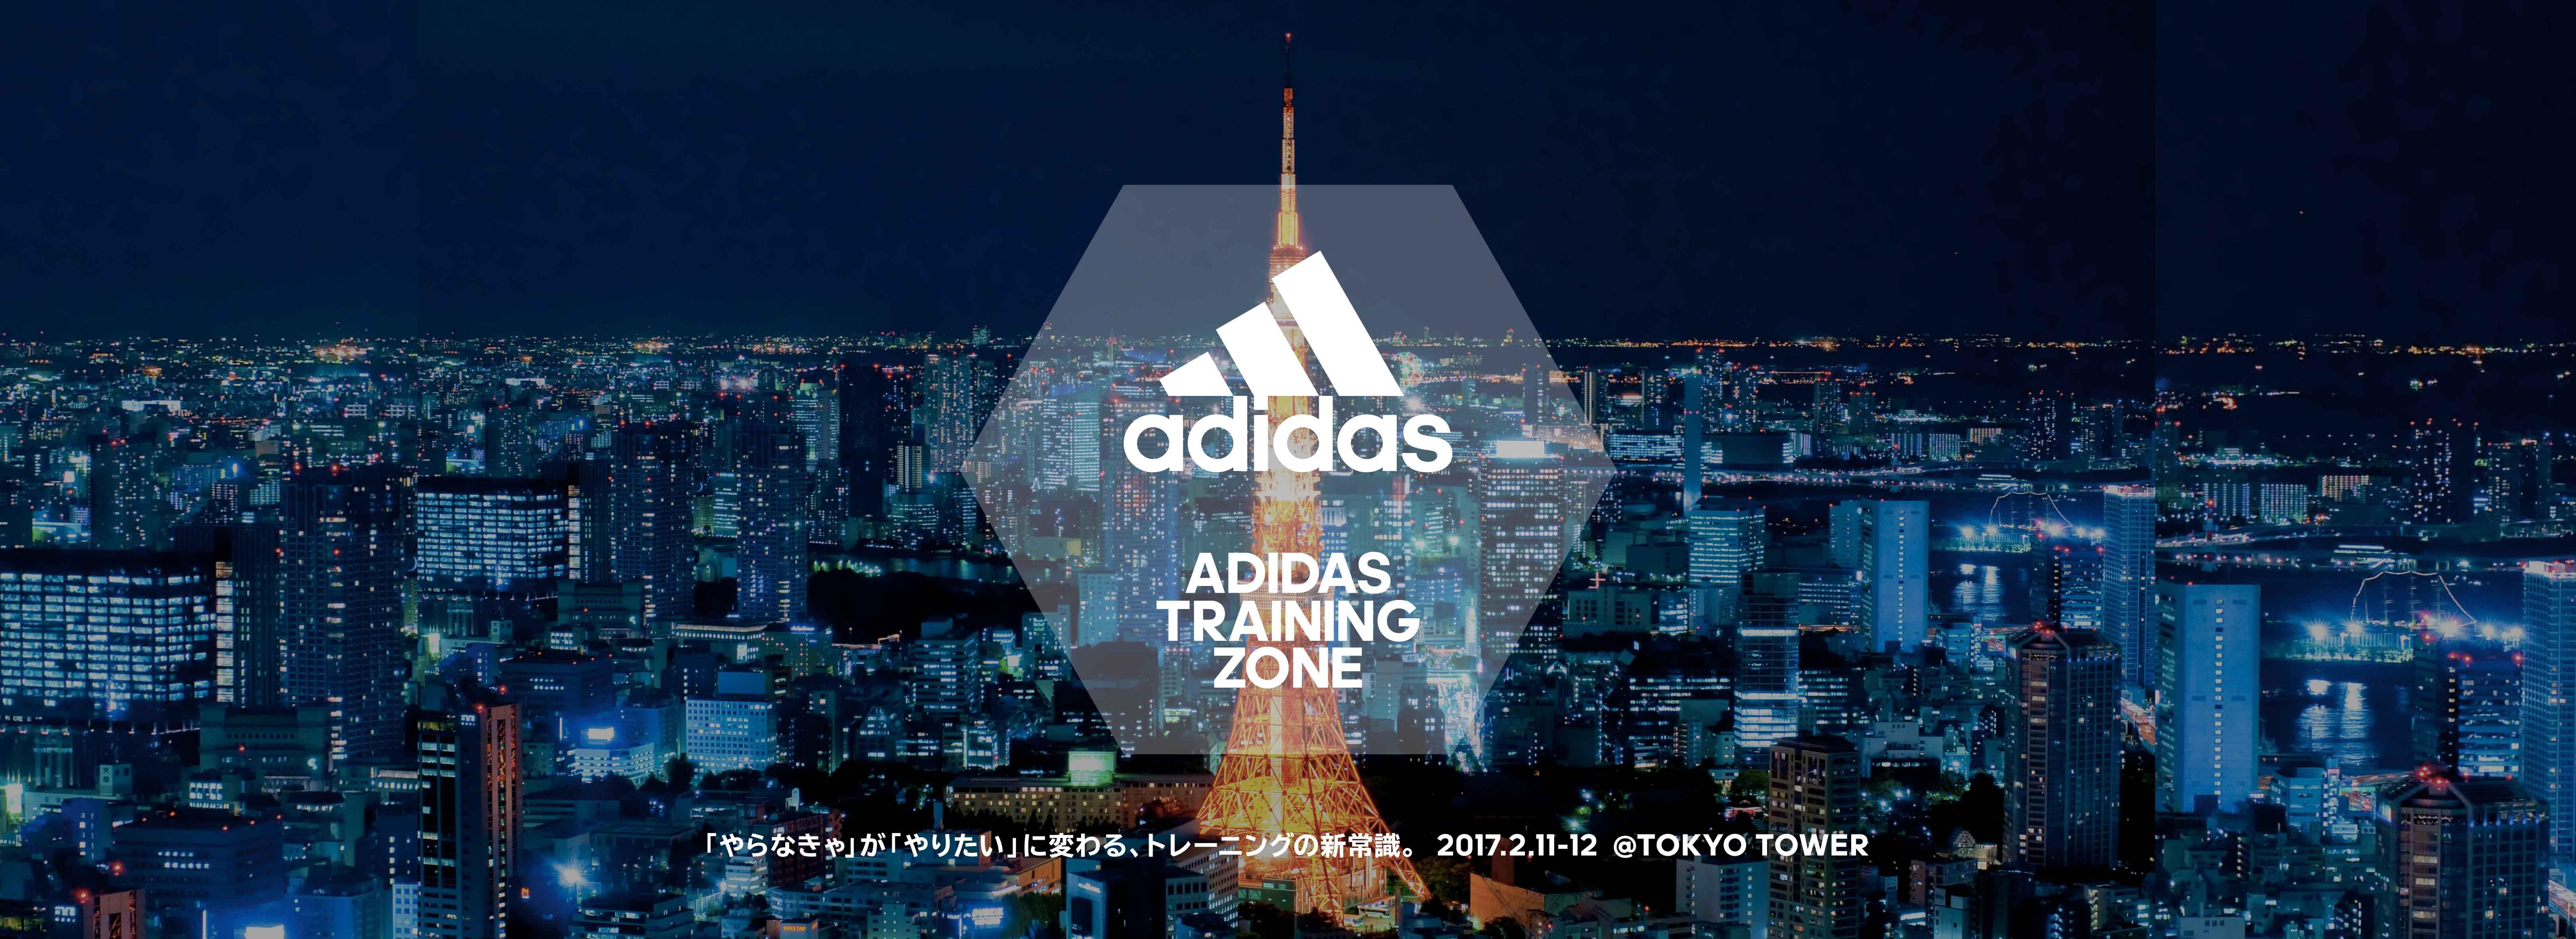 adidas-training-zone-kv-final-03